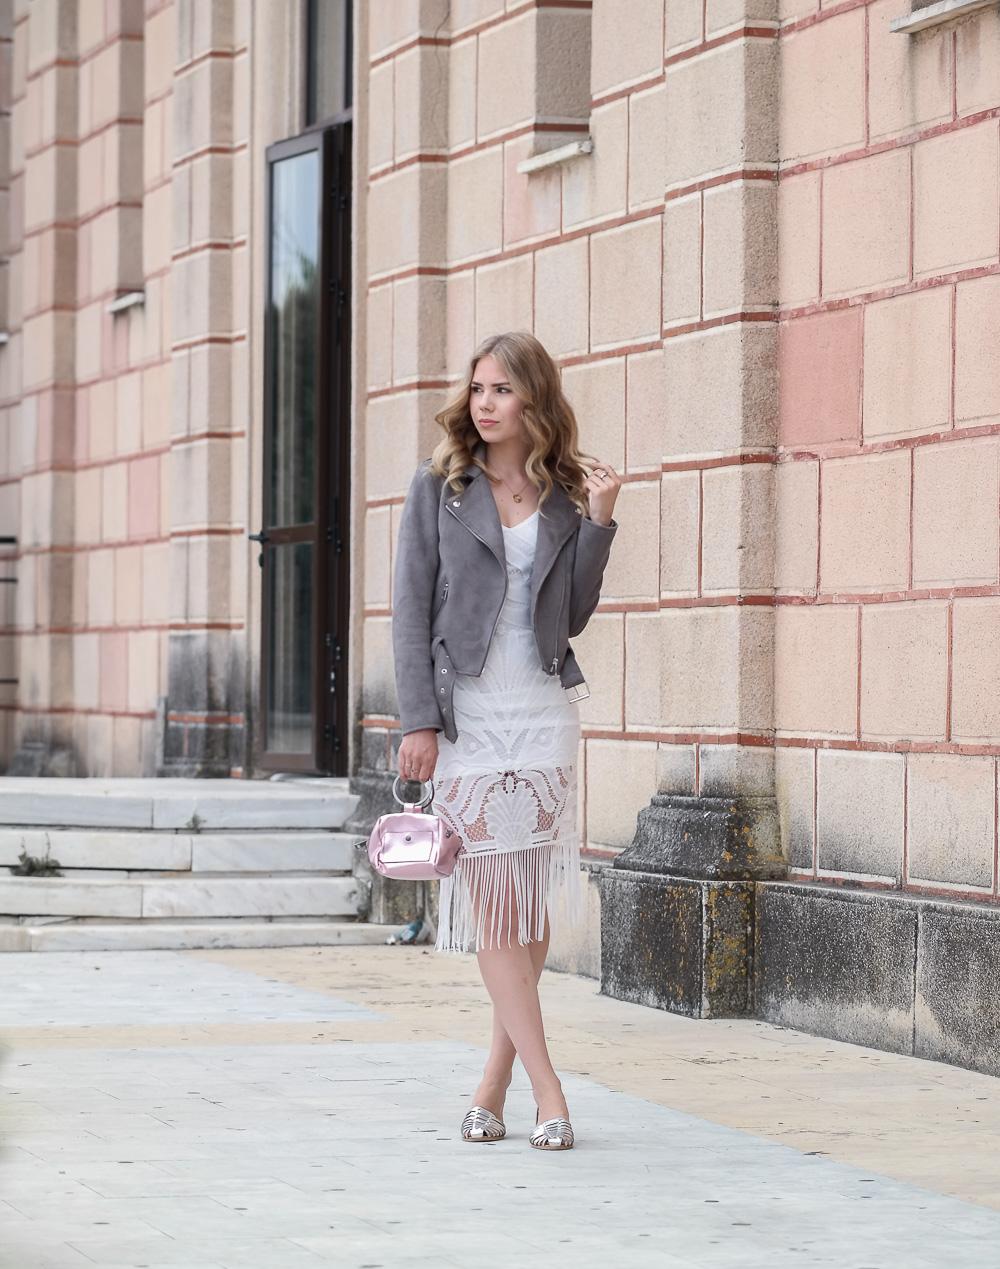 New-Look-Fashionblogger-Mode-Boho-Kleid-Bikerjacke-silberne-Sandaletten-Rosa-Tasche-Holiday-Look